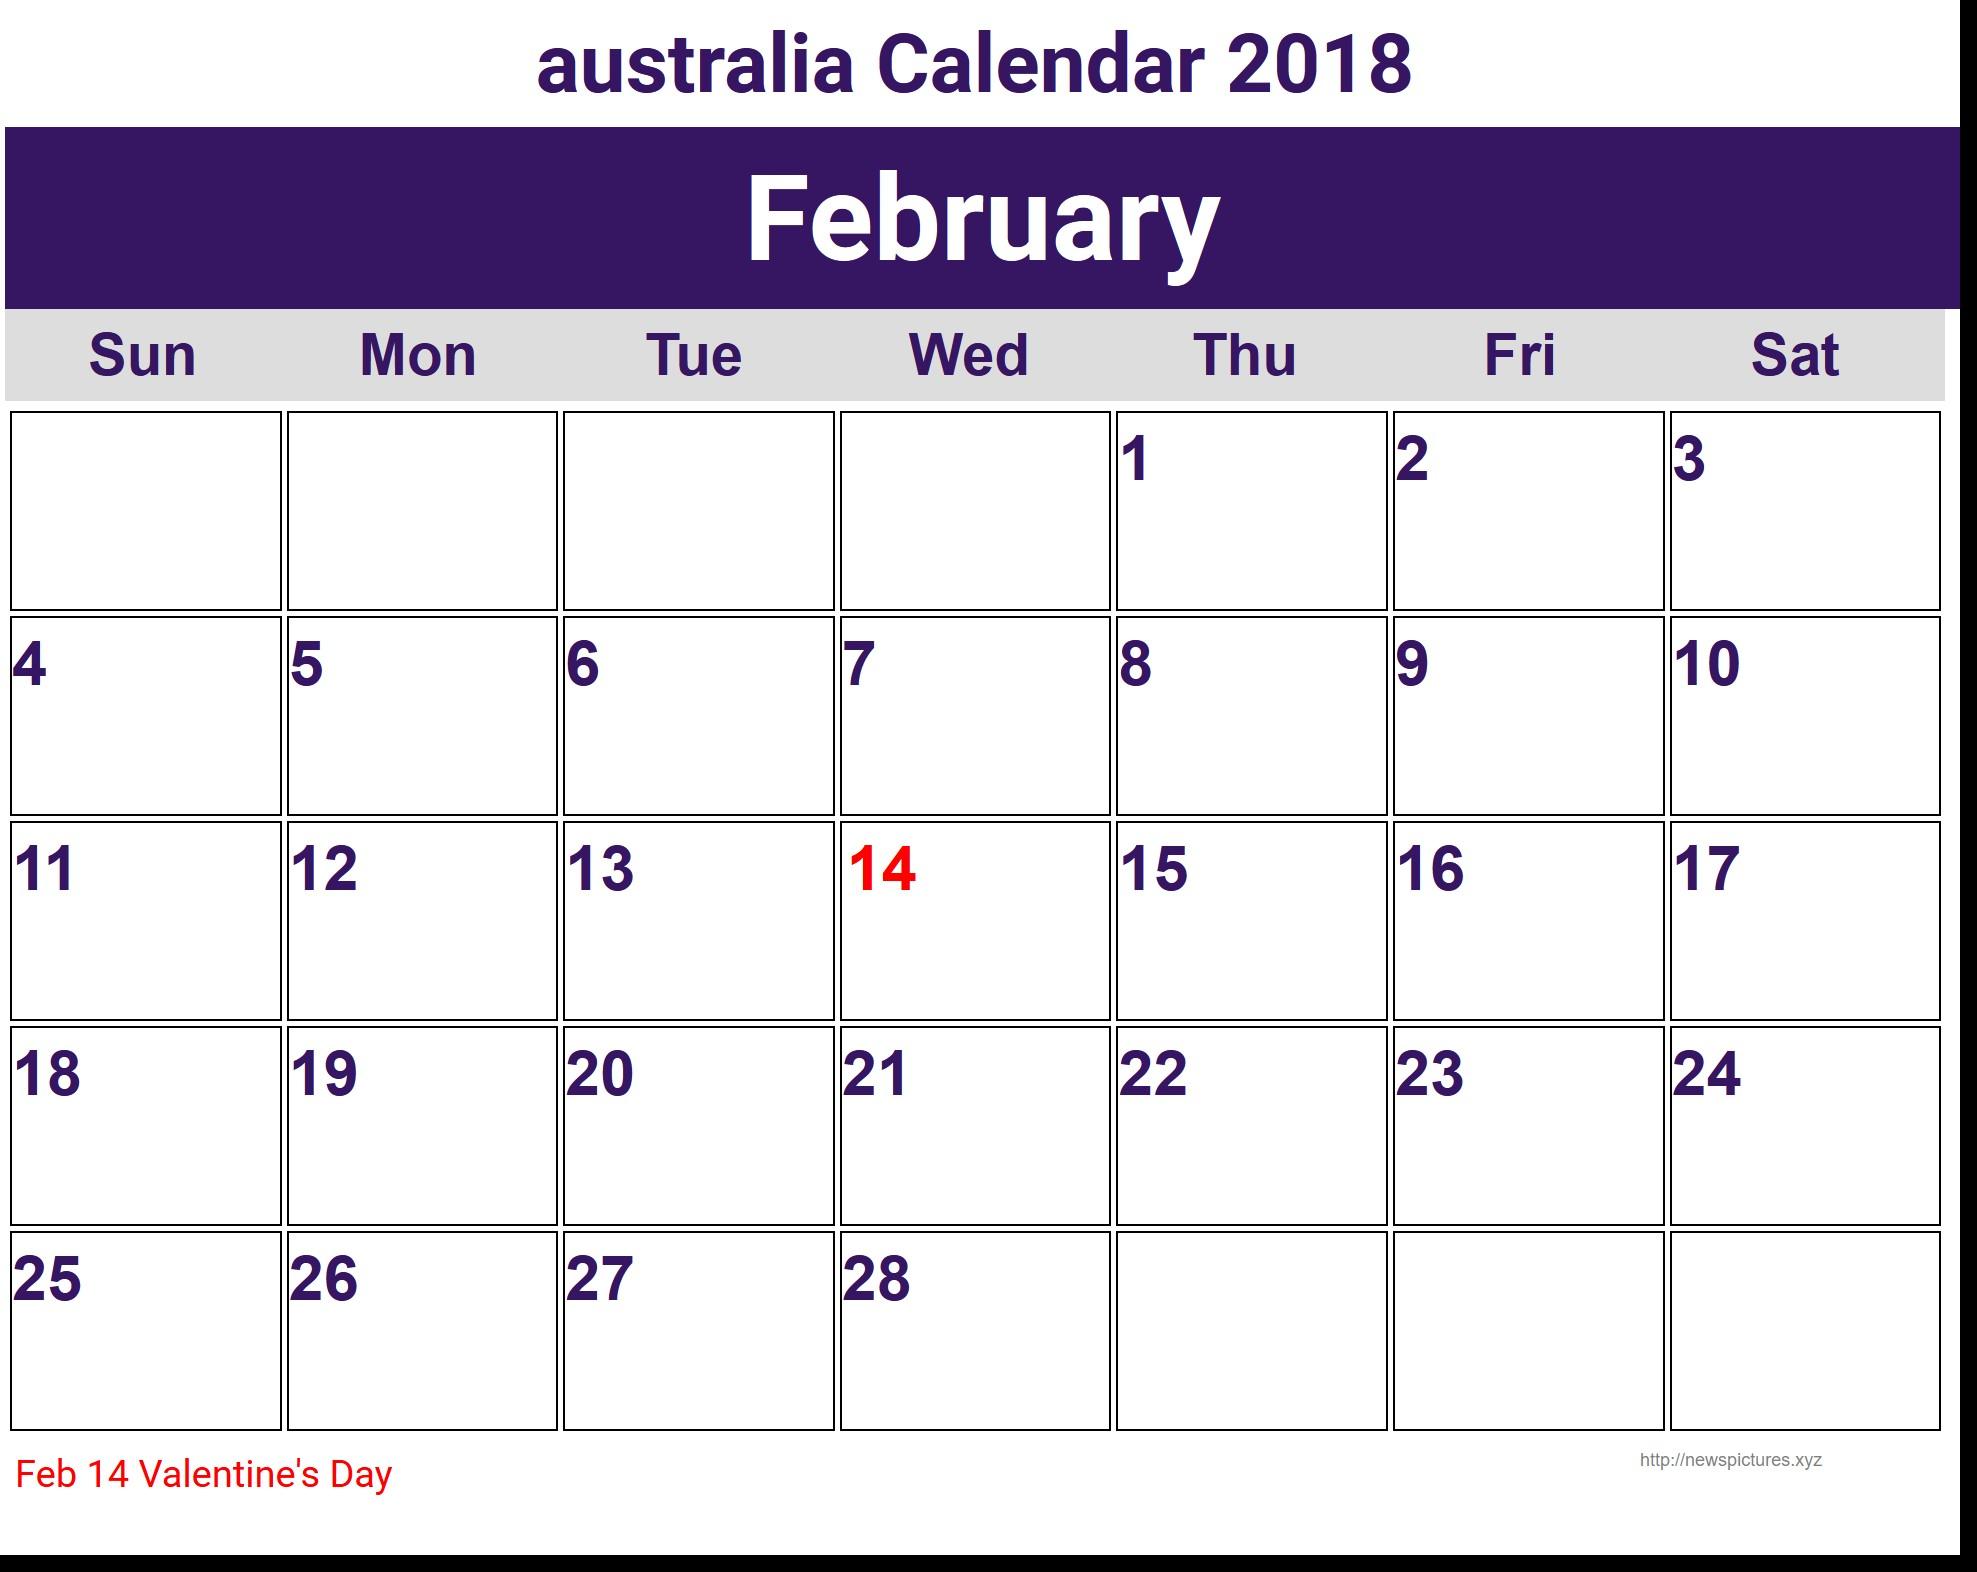 Printable Calendar Australia Printable February 2018 Calendar Australia with Holidays